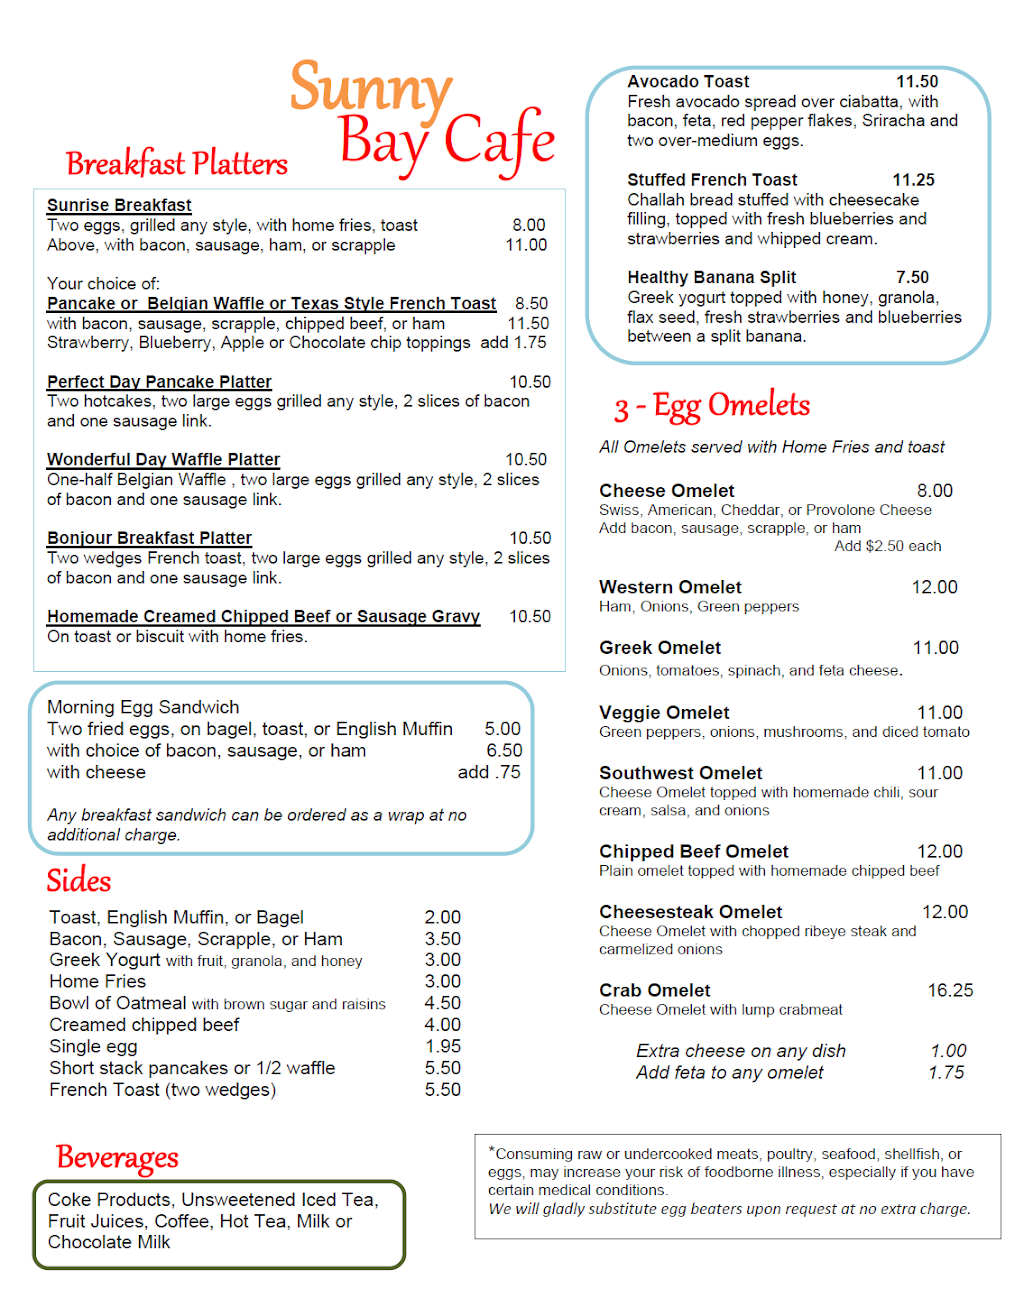 Sunny Bay Cafe   restaurant   236 Rehoboth Ave, Rehoboth Beach, DE 19971, USA   3025672344 OR +1 302-567-2344